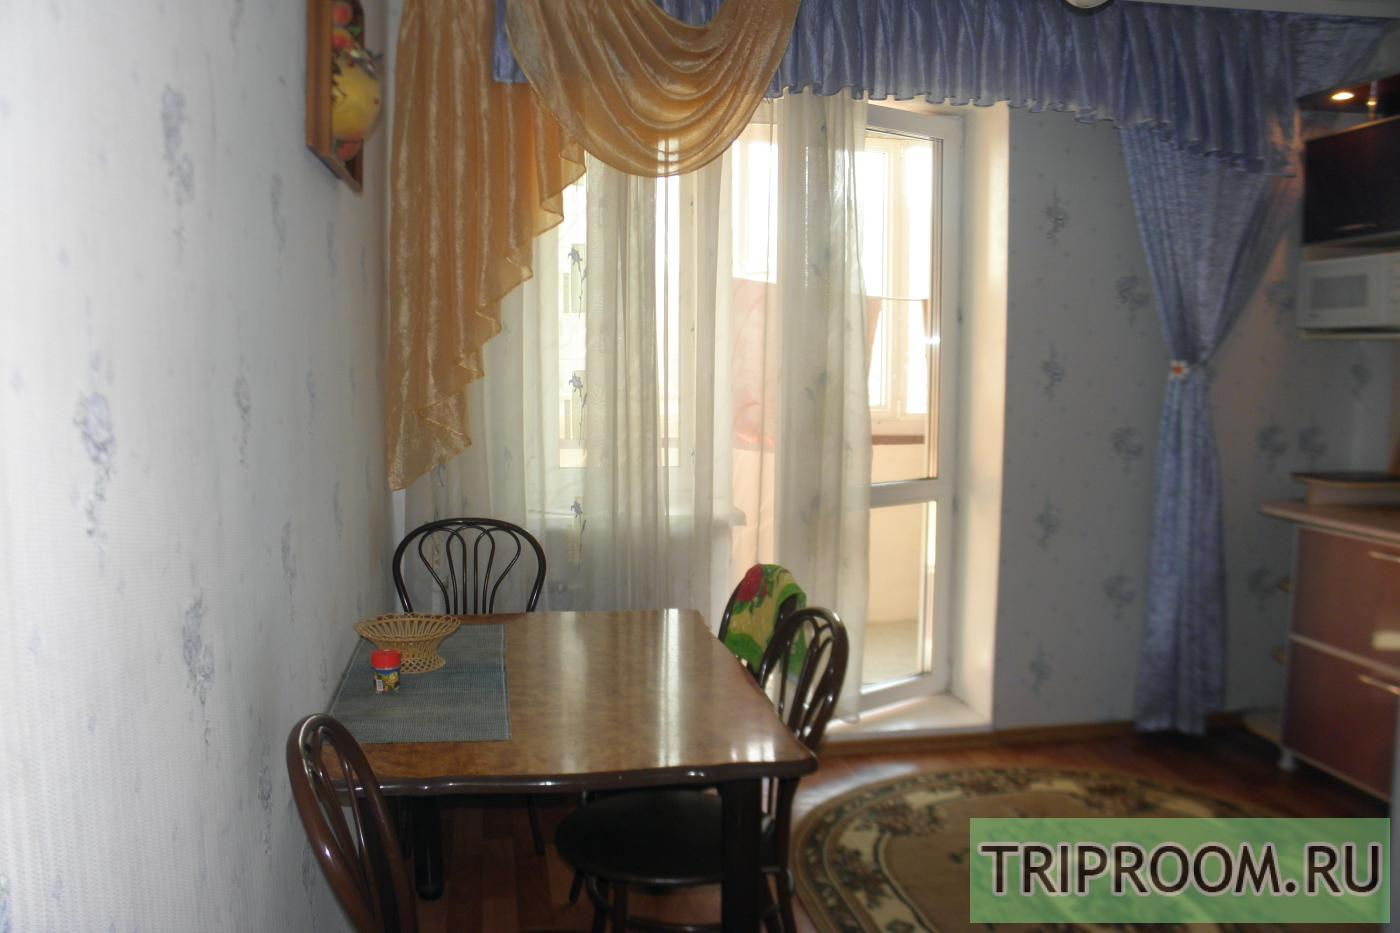 1-комнатная квартира посуточно (вариант № 1497), ул. Флегонтова улица, фото № 7